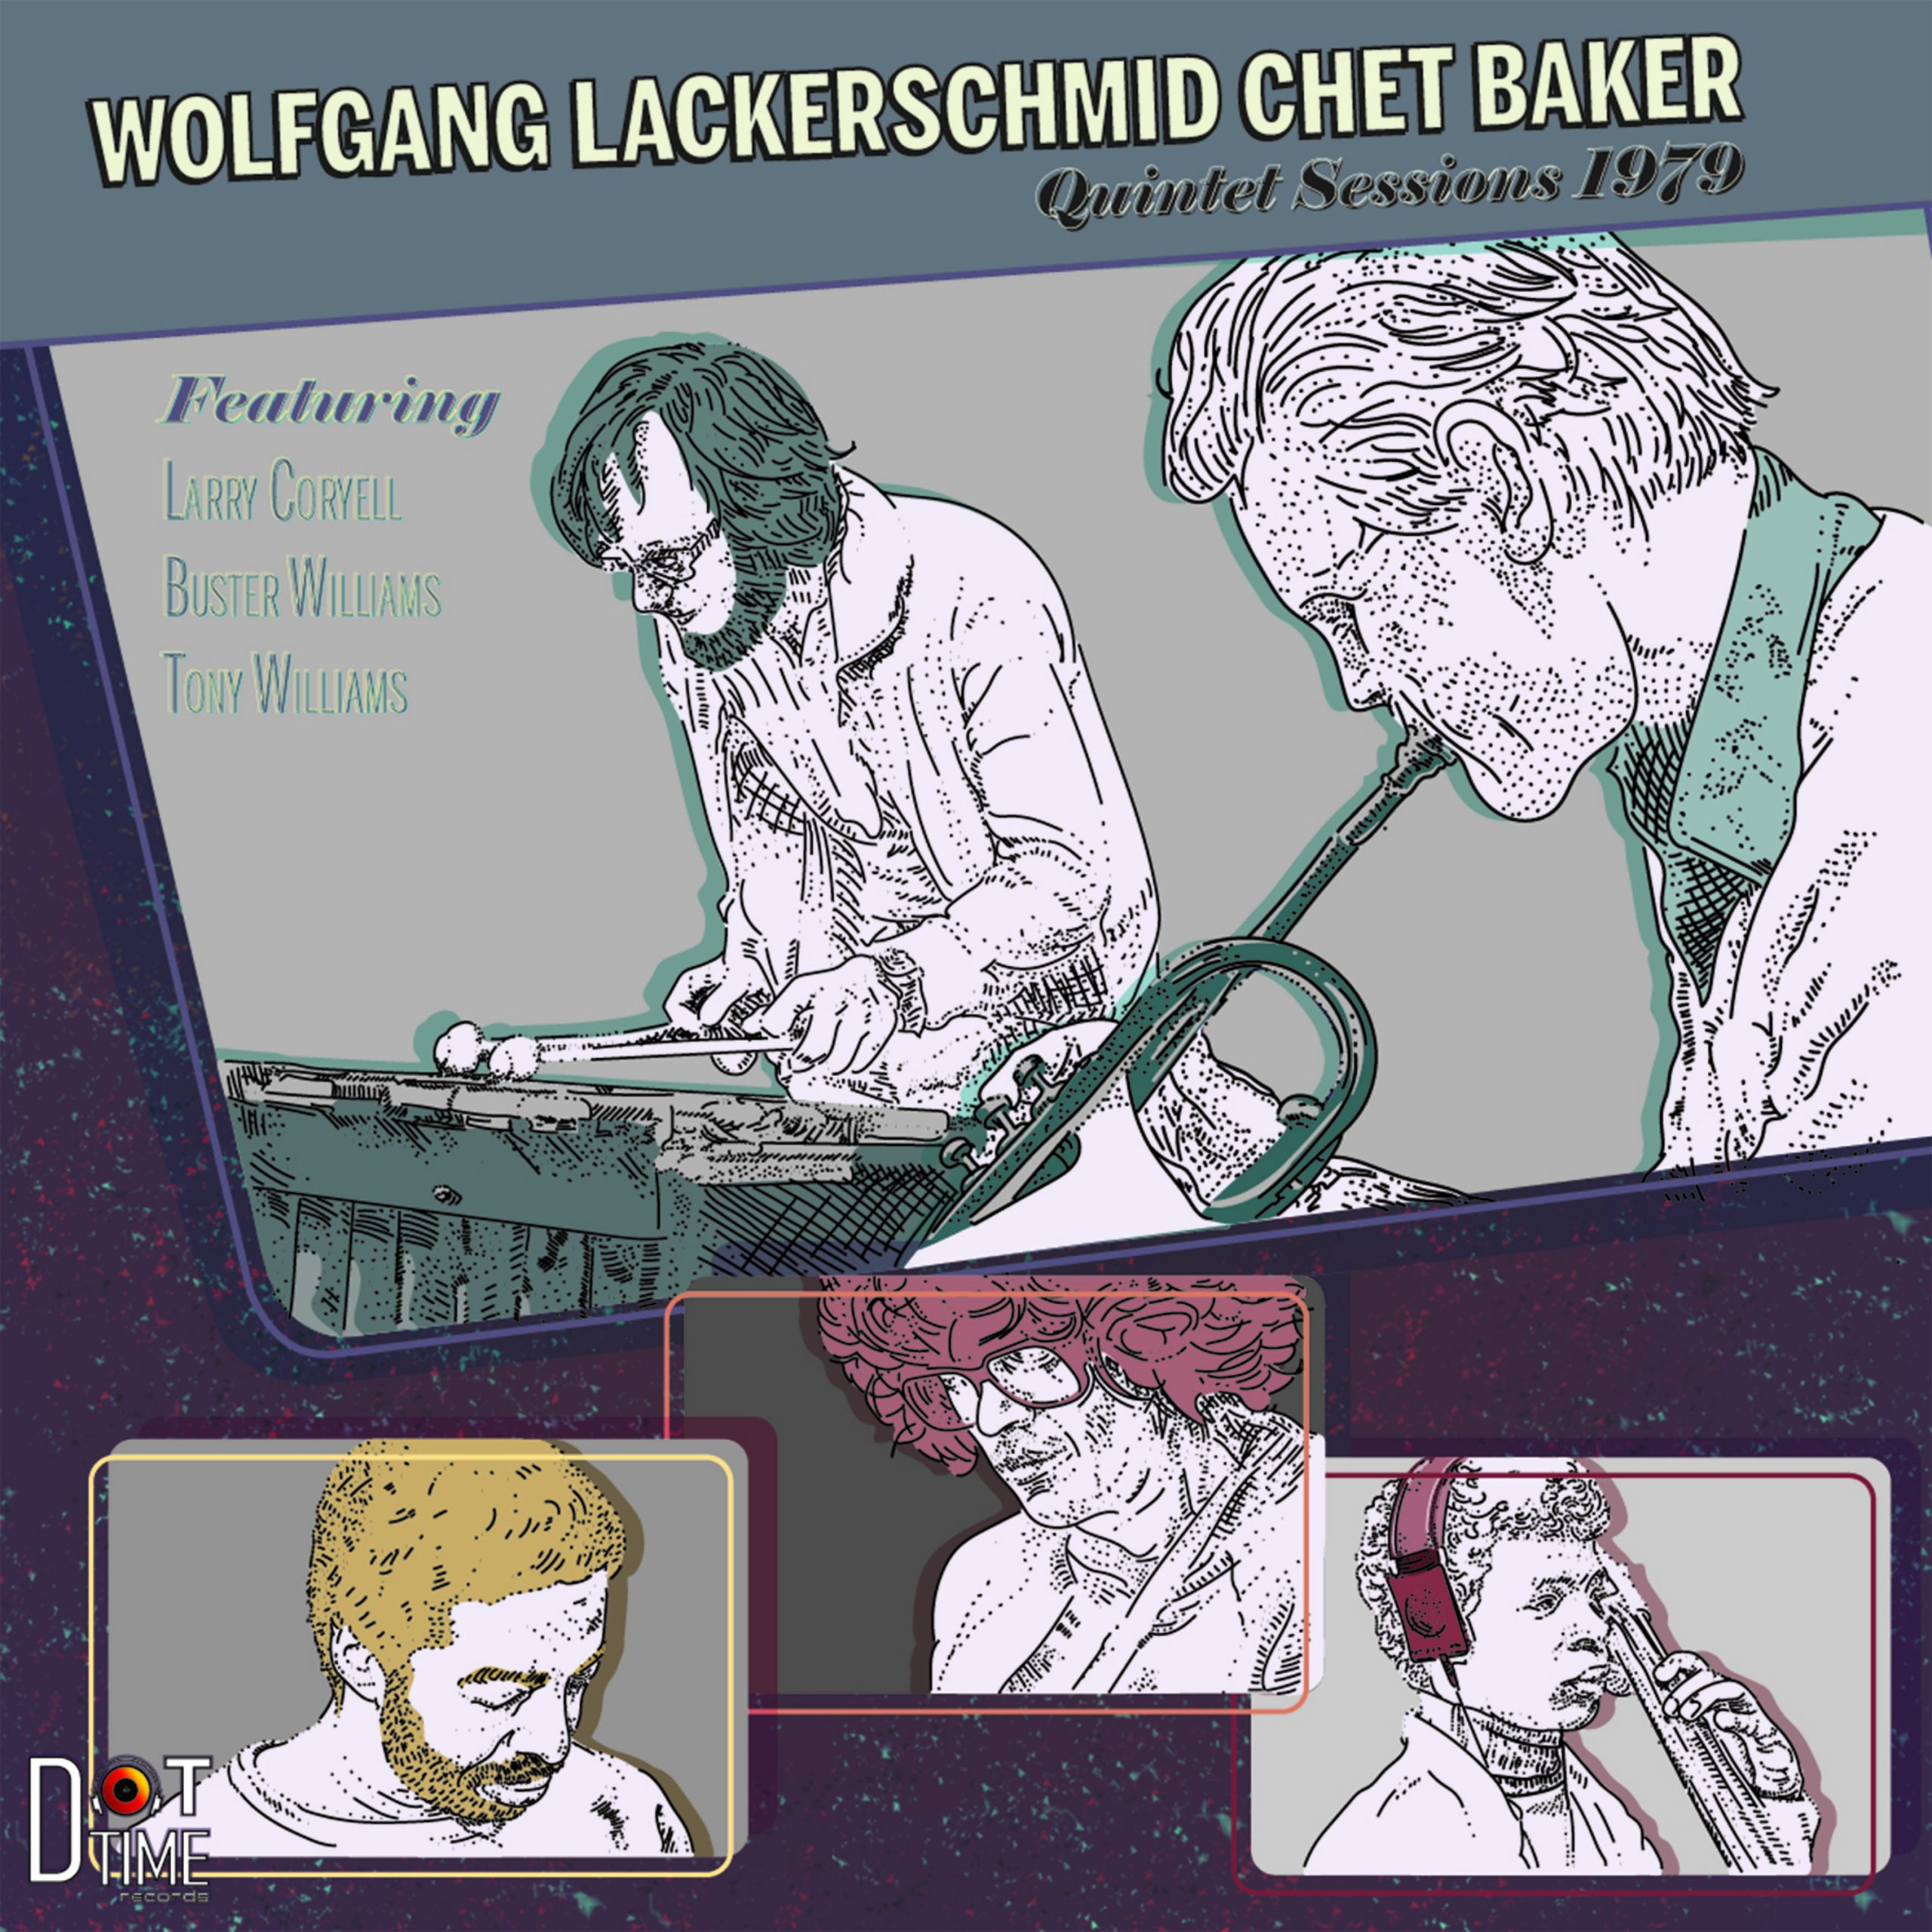 REVIEW: Wolfgang Lackerschmid & Chet Baker – Quintet Sessions 1979 – Audiophile Audition